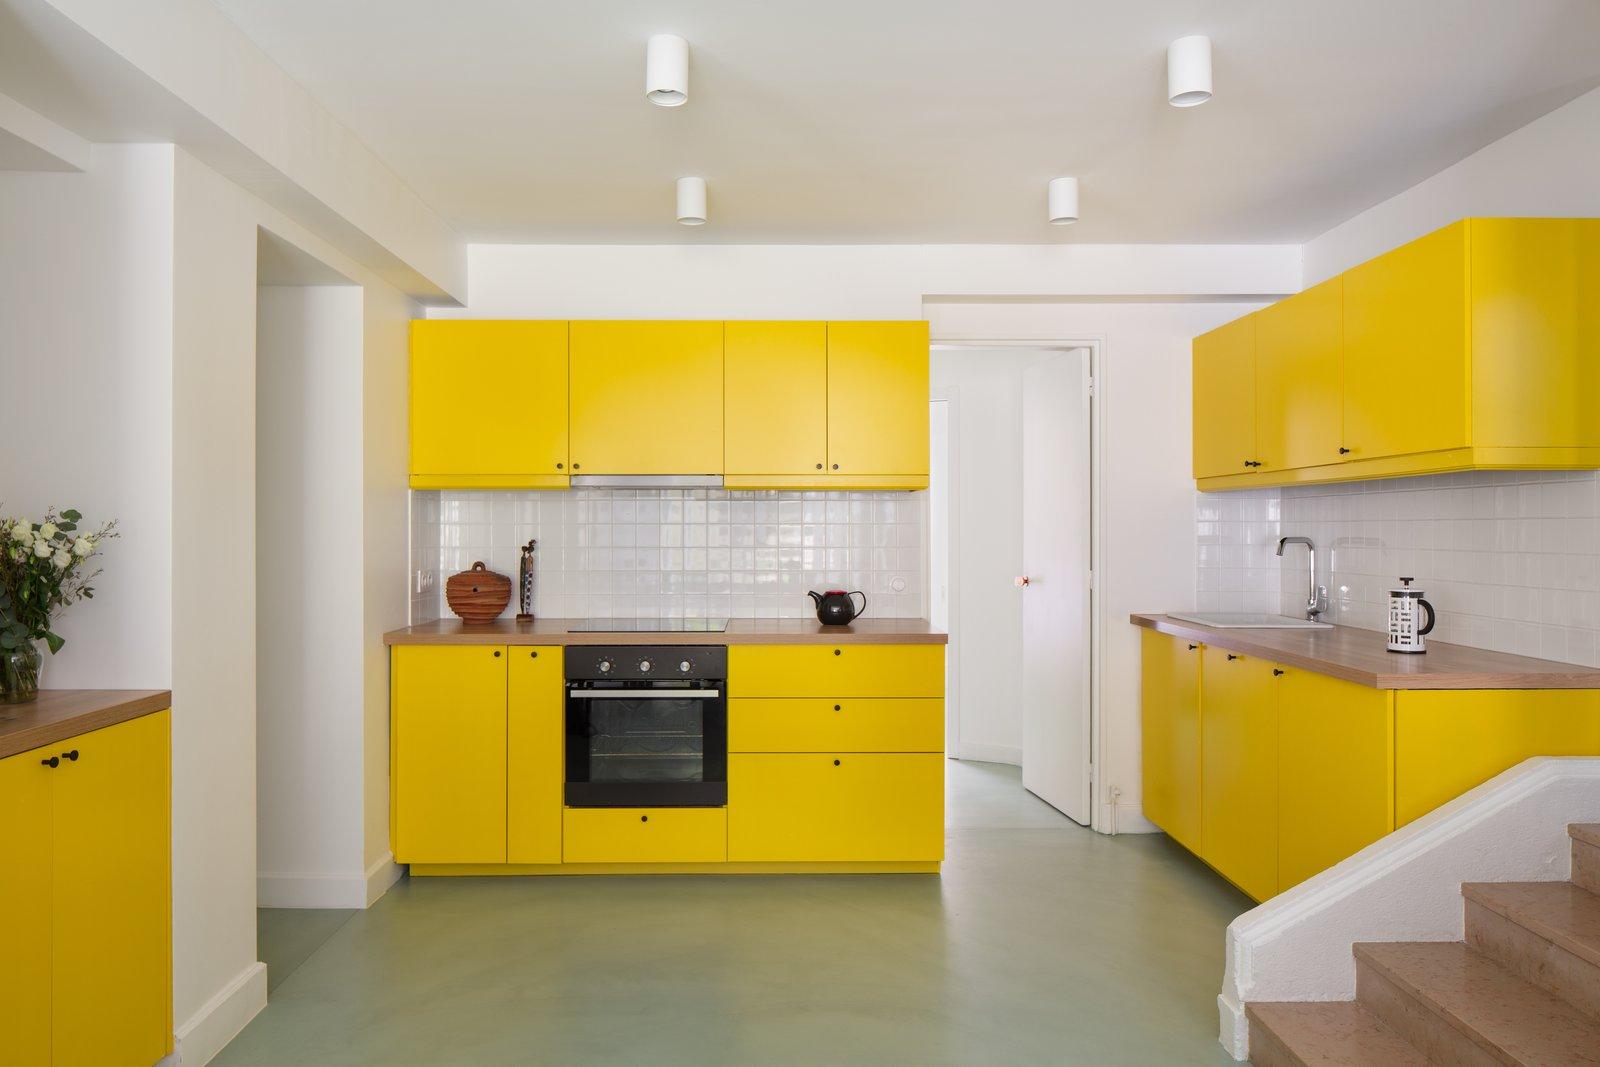 Atelier Pierre-Louis Gerlier colorful kitchen